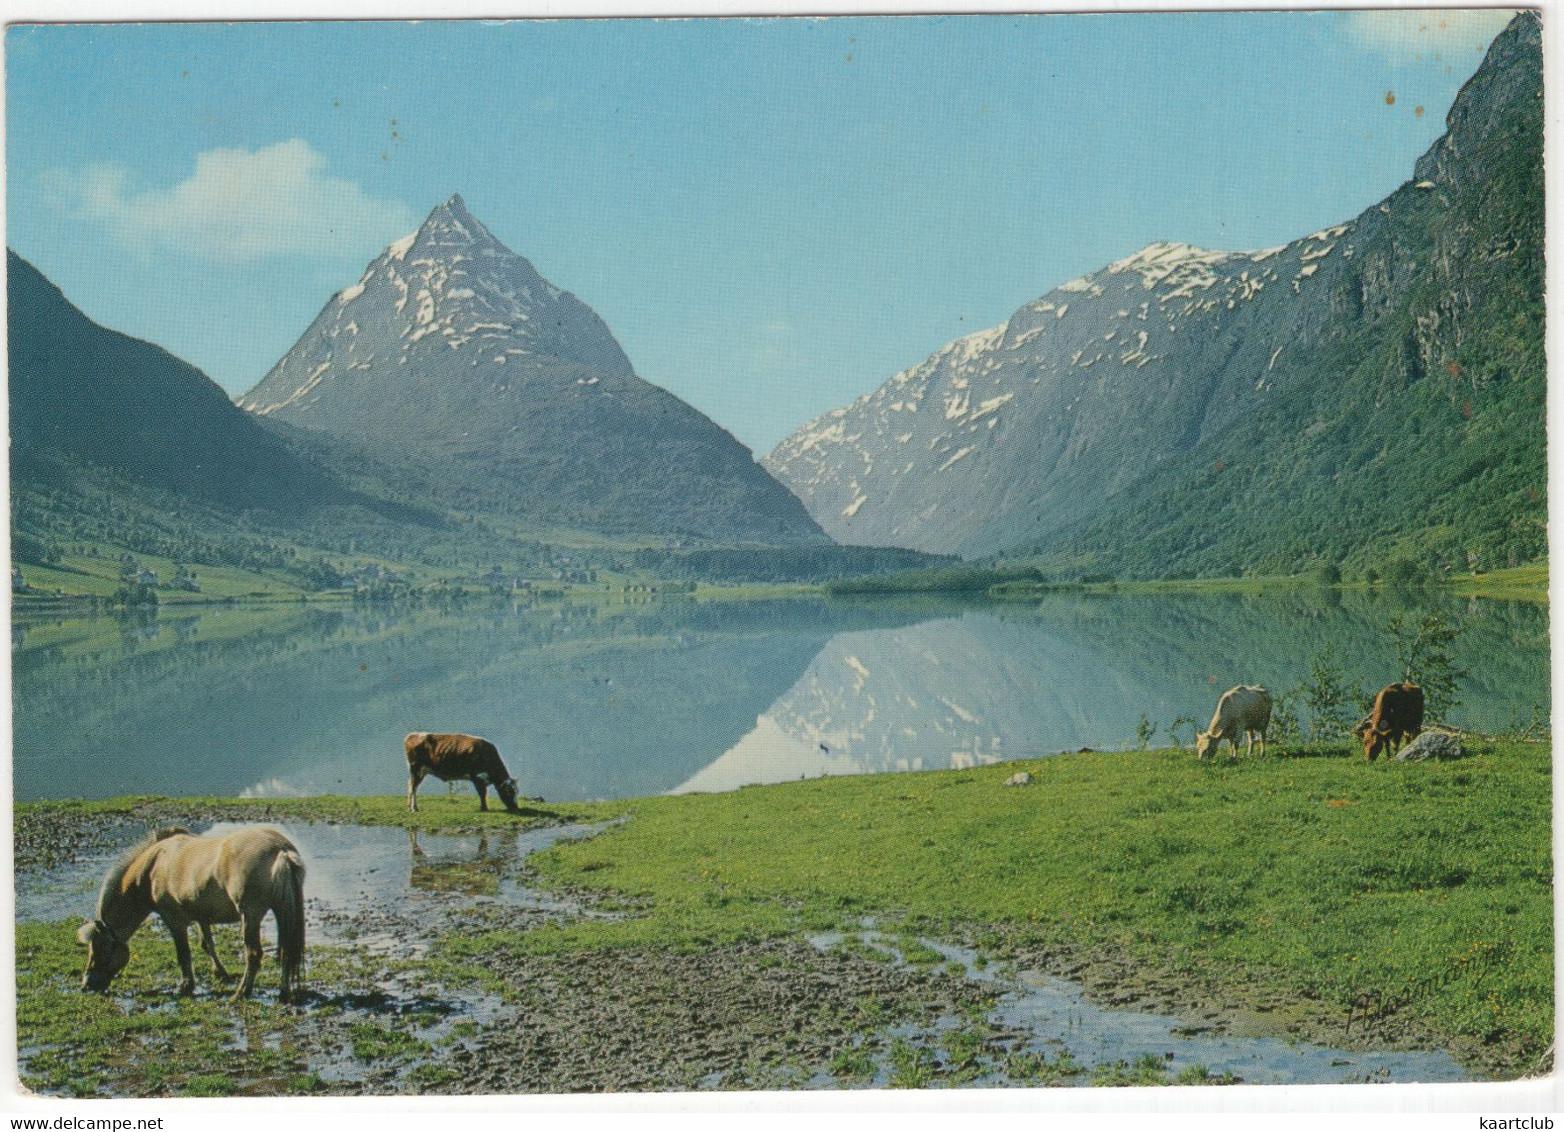 Norge: Parti Fra Byrkjelo, Nordfjord, Mot Eggenipa  - (Norge/Norway) - Horses -  (Normann) - Noruega